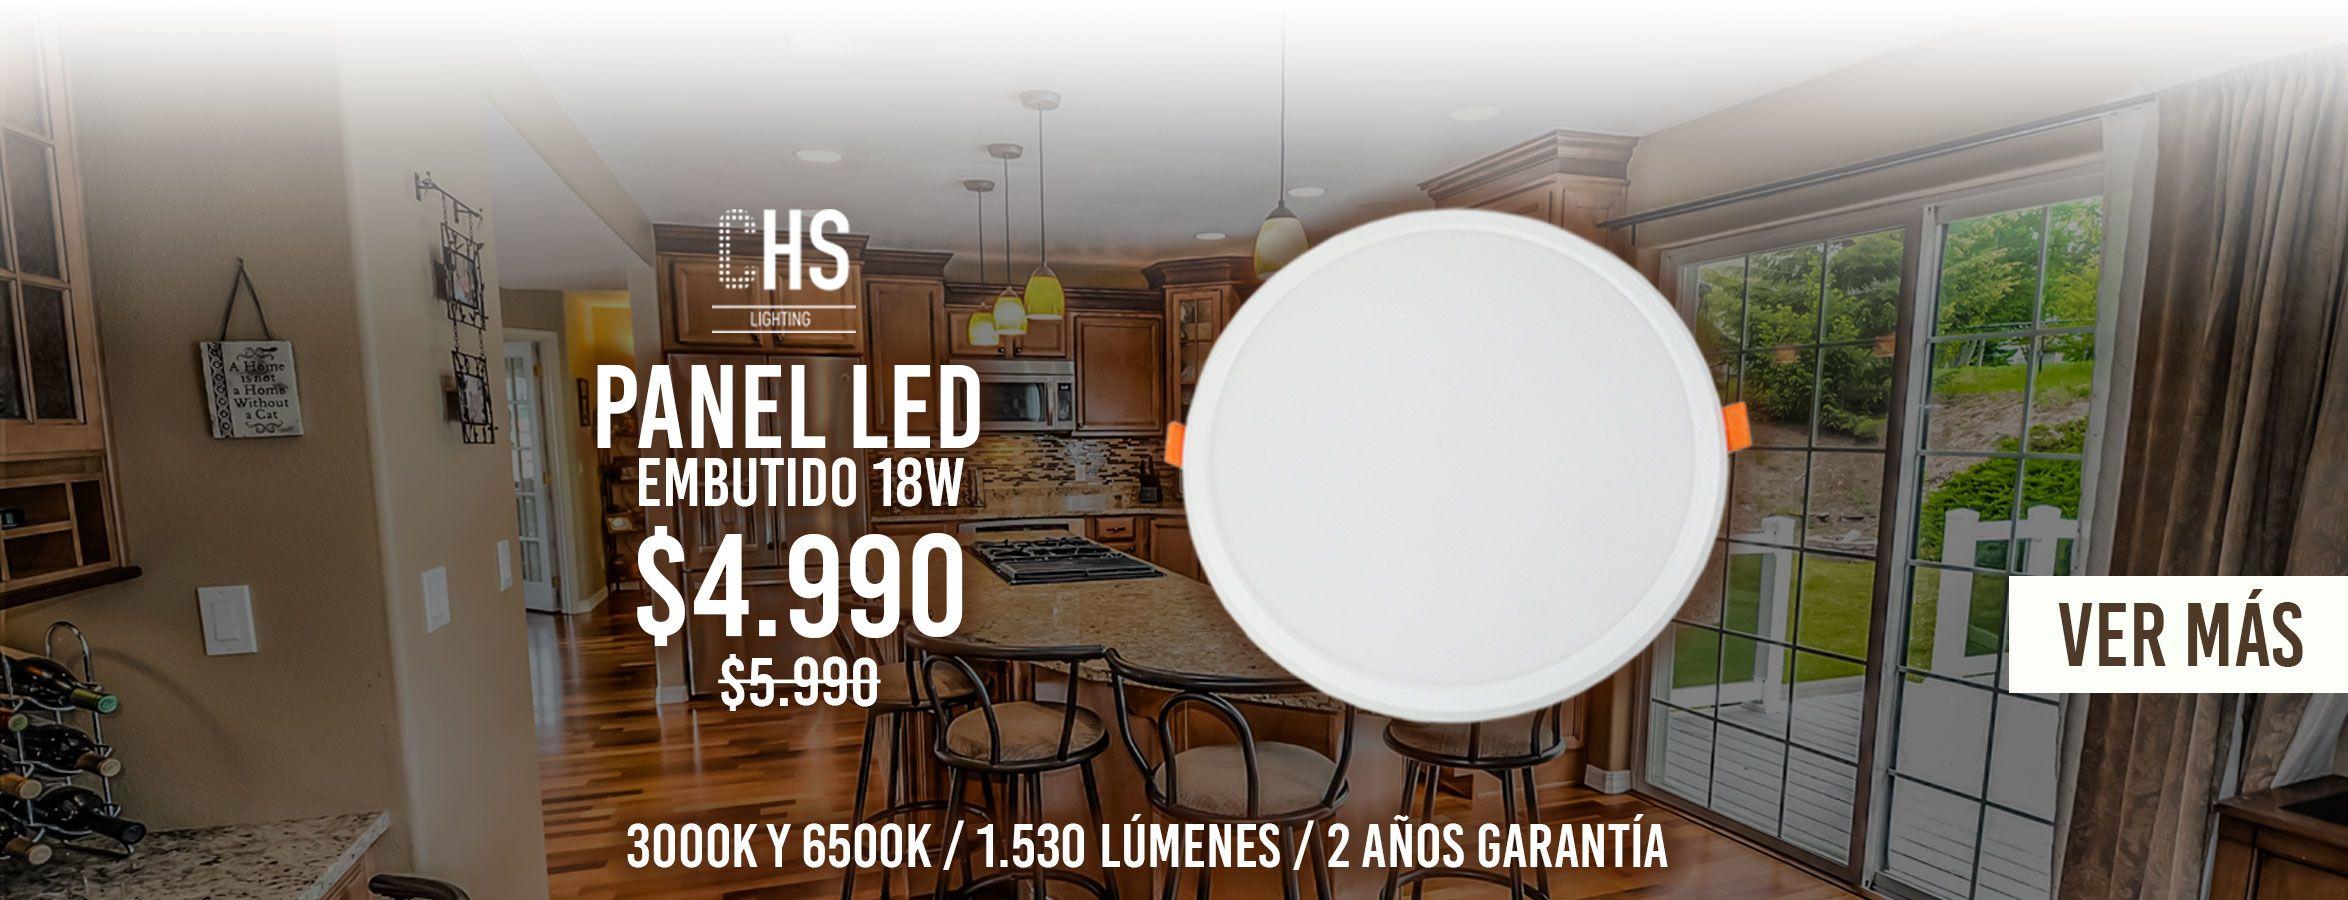 PANEL LED EMBUTIDO 18W - CHS